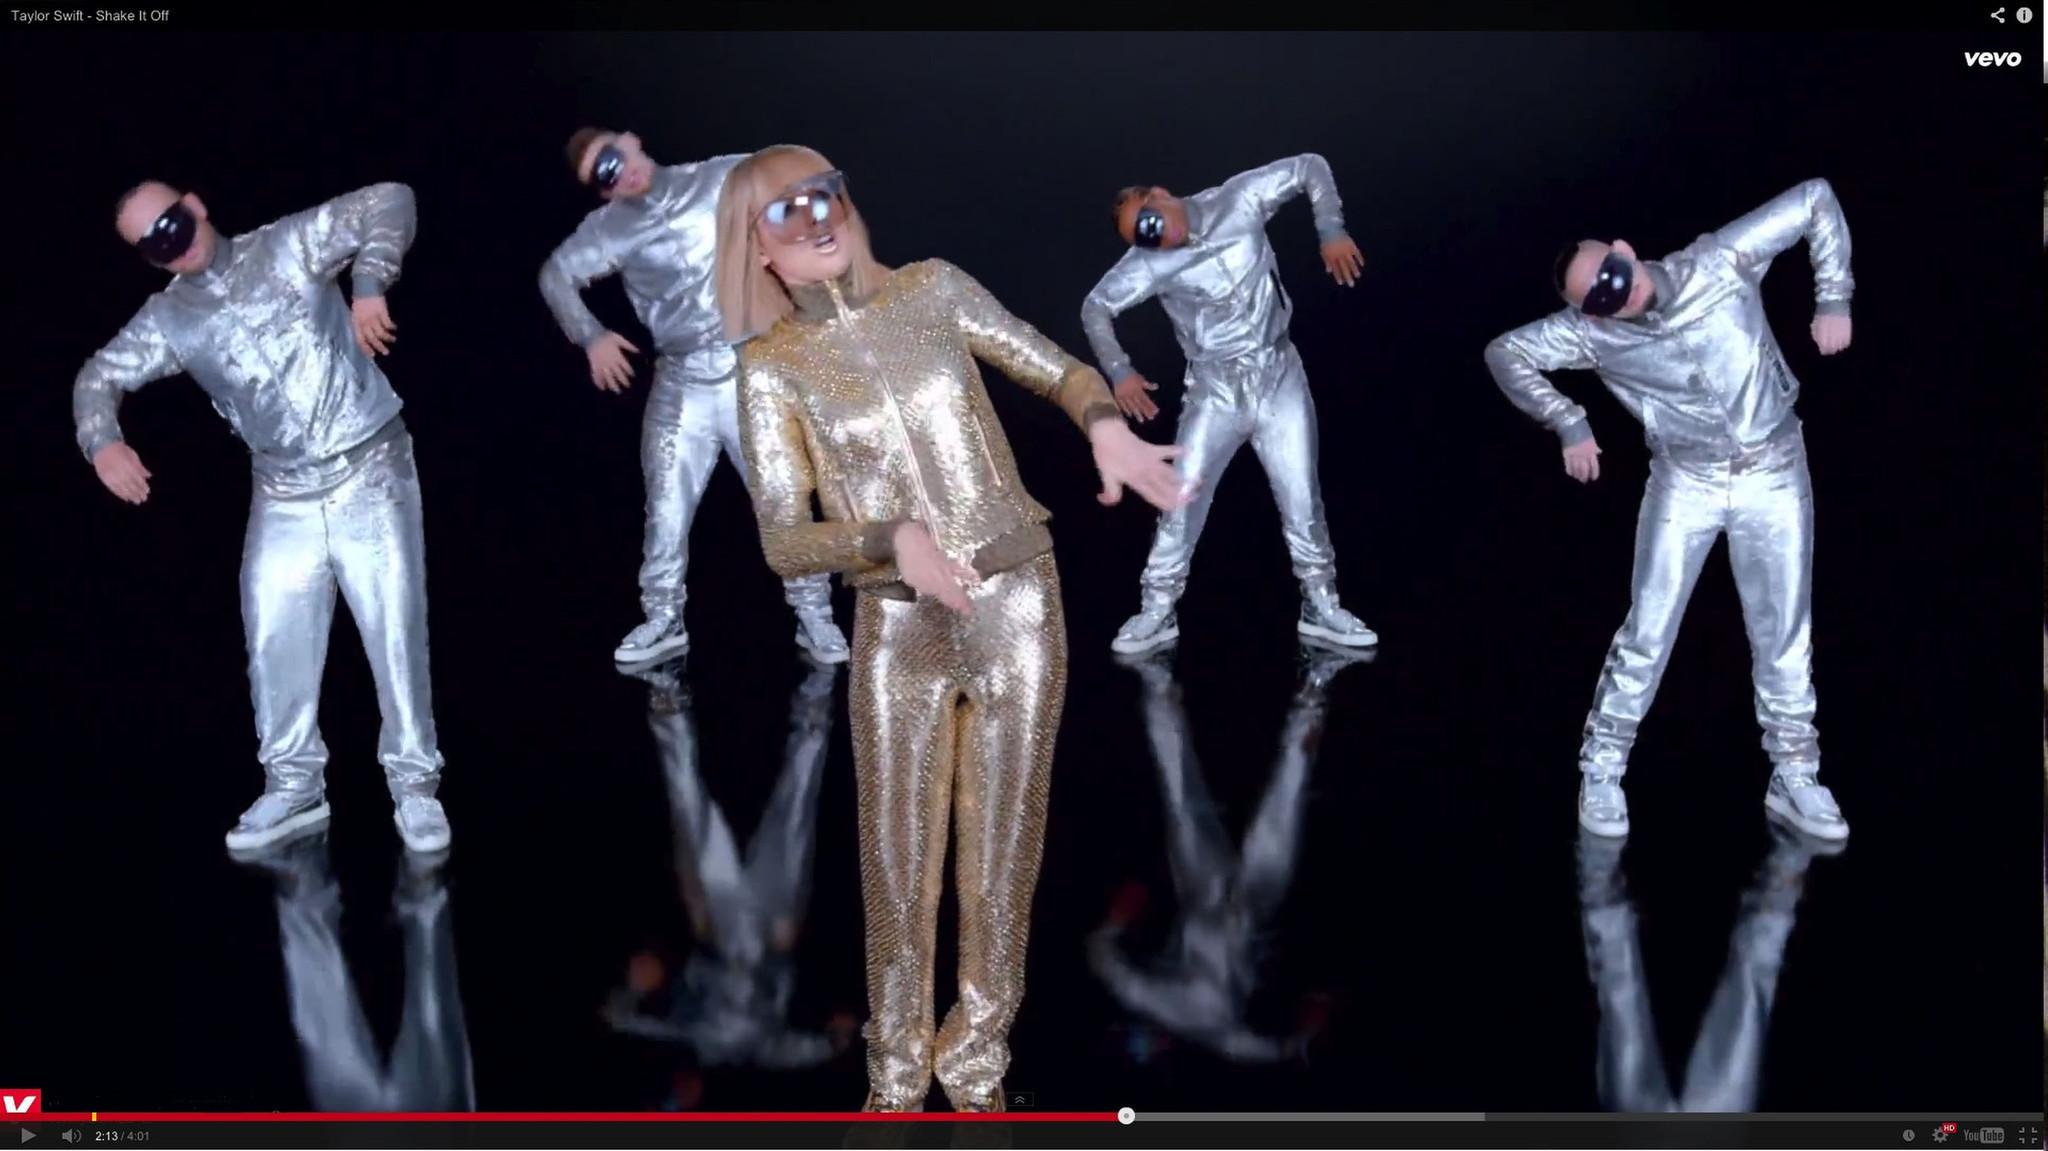 Director Mark Romanek defends Taylor Swift's 'Shake It Off' video